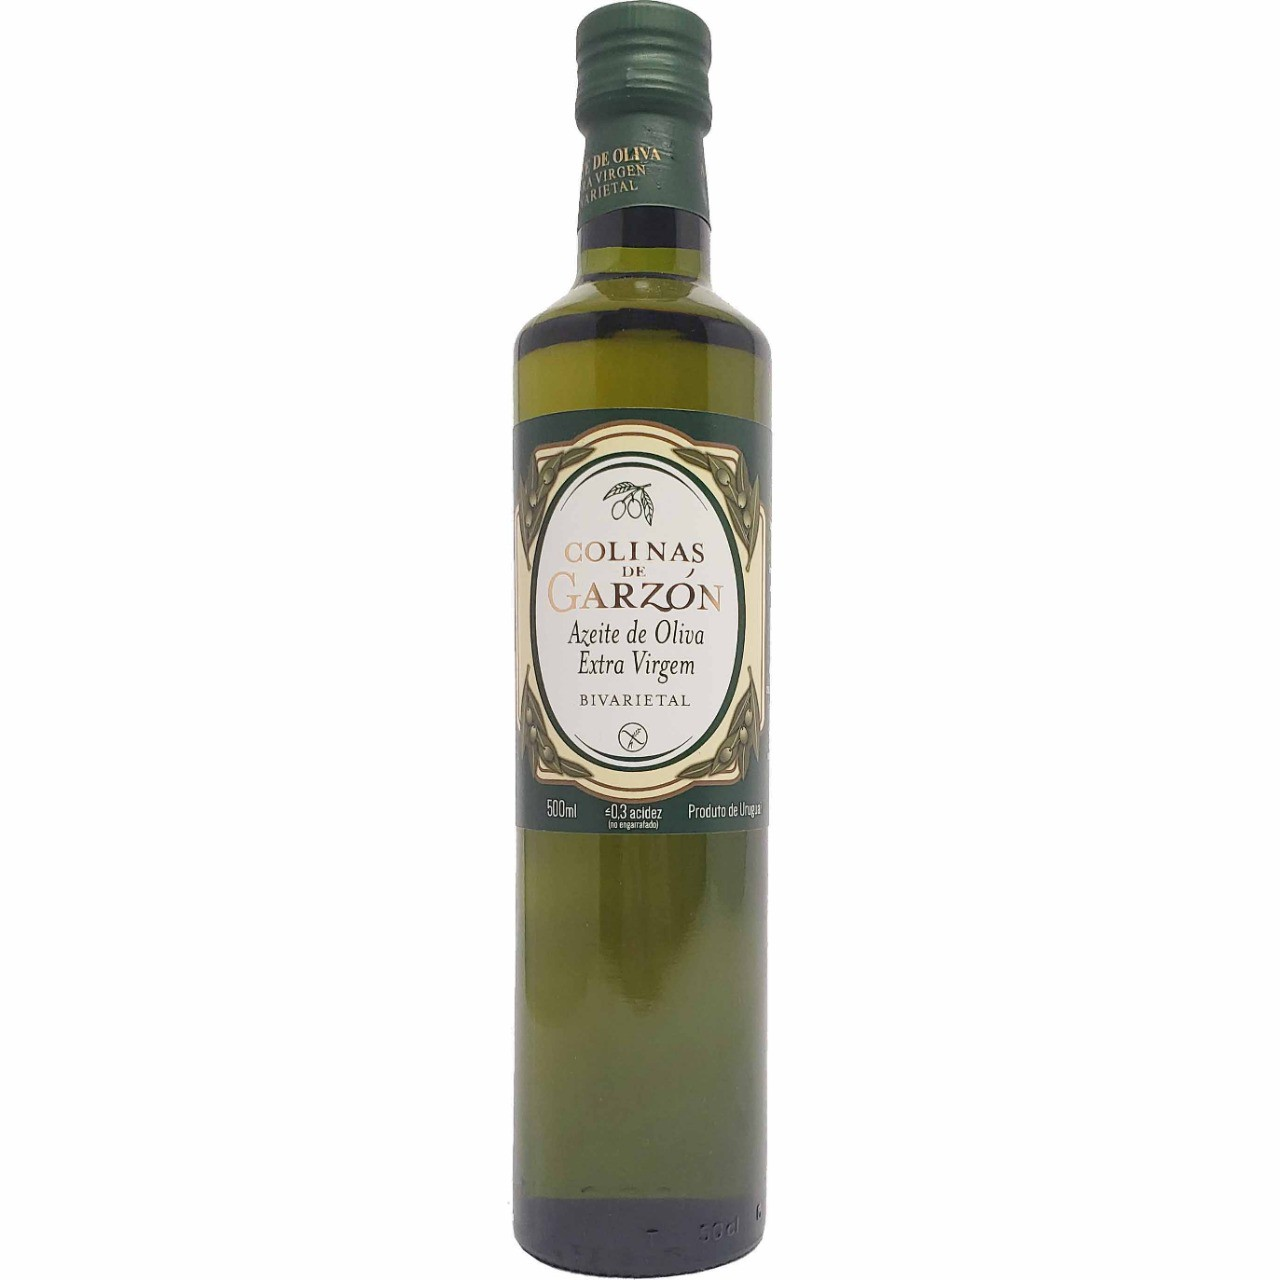 Azeite de Oliva Extra Virgem Bivarietal Colinas de Garzón - 500ml -